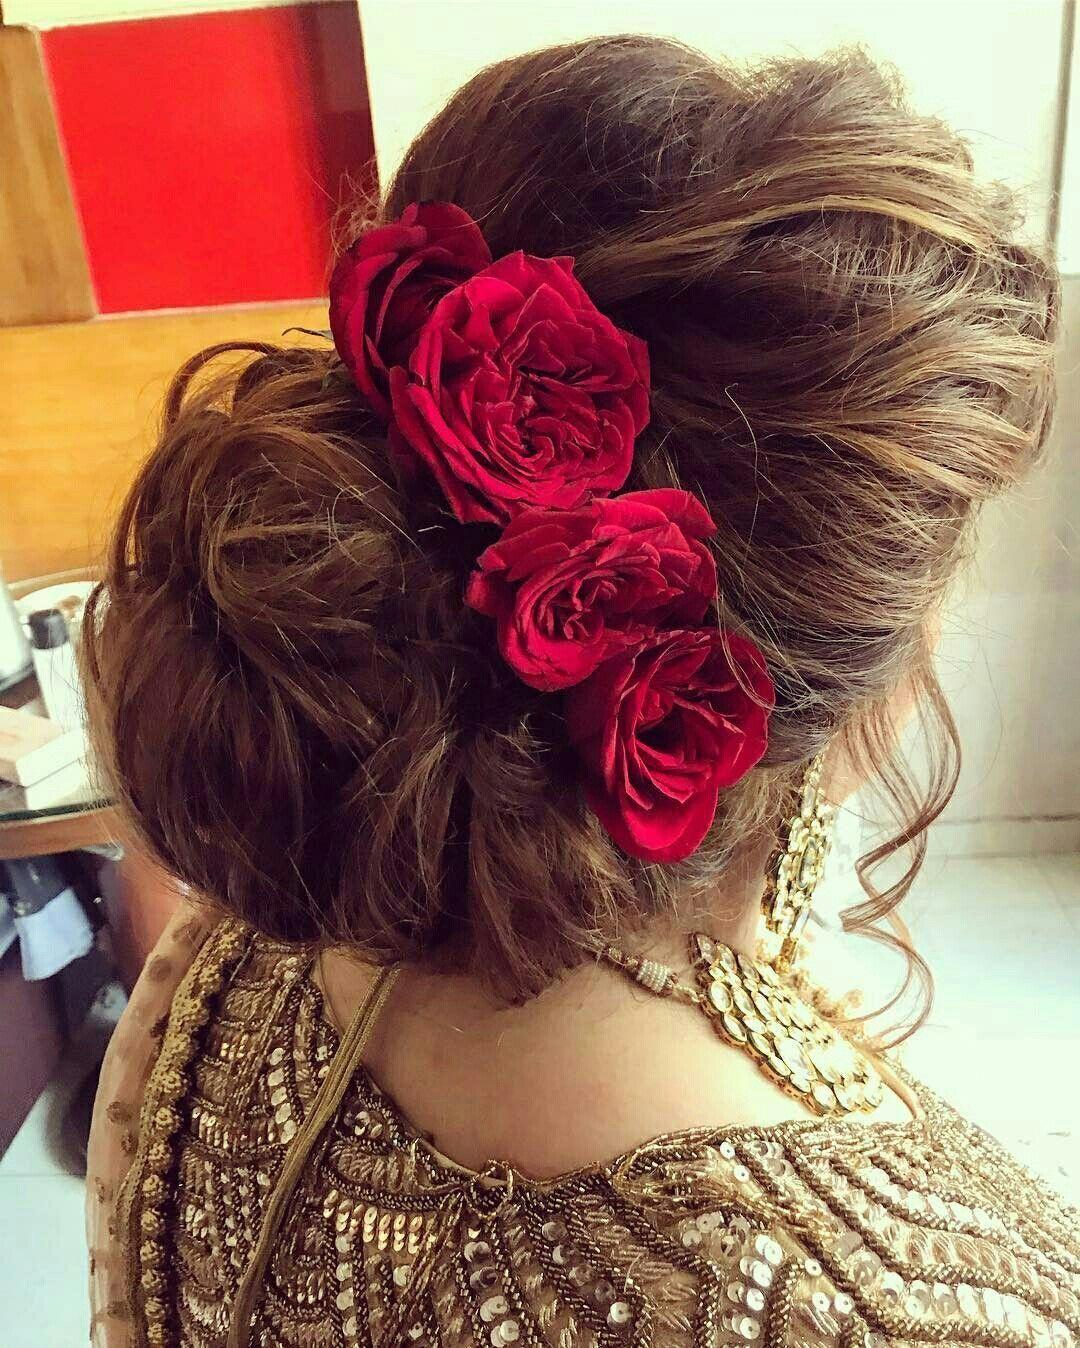 Bun Hairstyle Ideas Bridal Hairstyle Ideas Unique Hairstyle Wedding Hairstyle In Wedding Hairstyles For Long Hair Bridal Hair Inspiration Bun Hairstyles